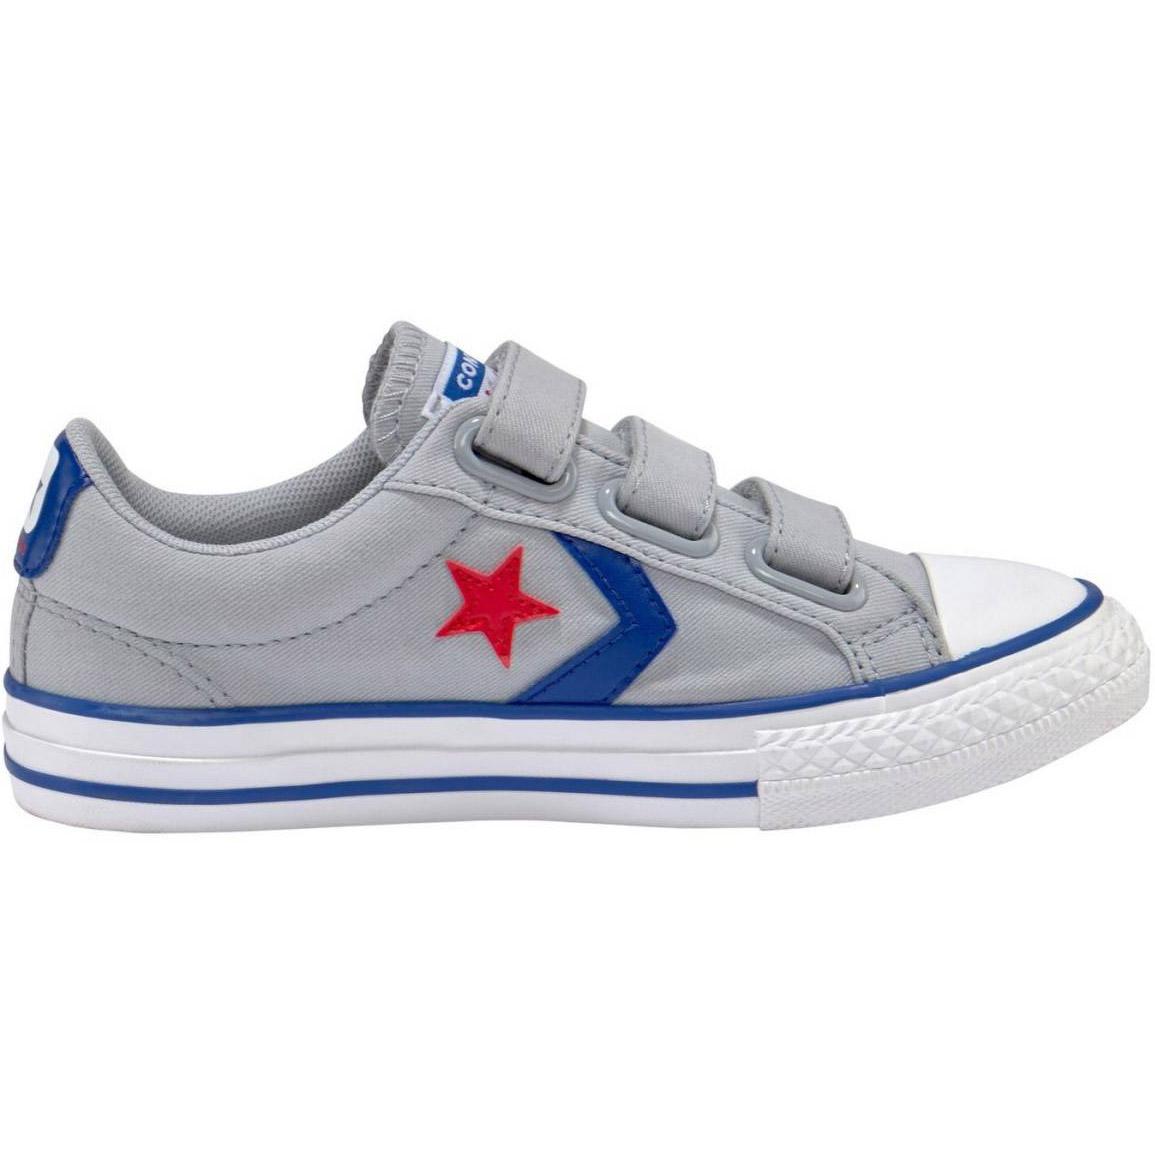 027916d5d2207 Converse Star Player EV 3V OX Kinder Sneaker grau blau 663601C